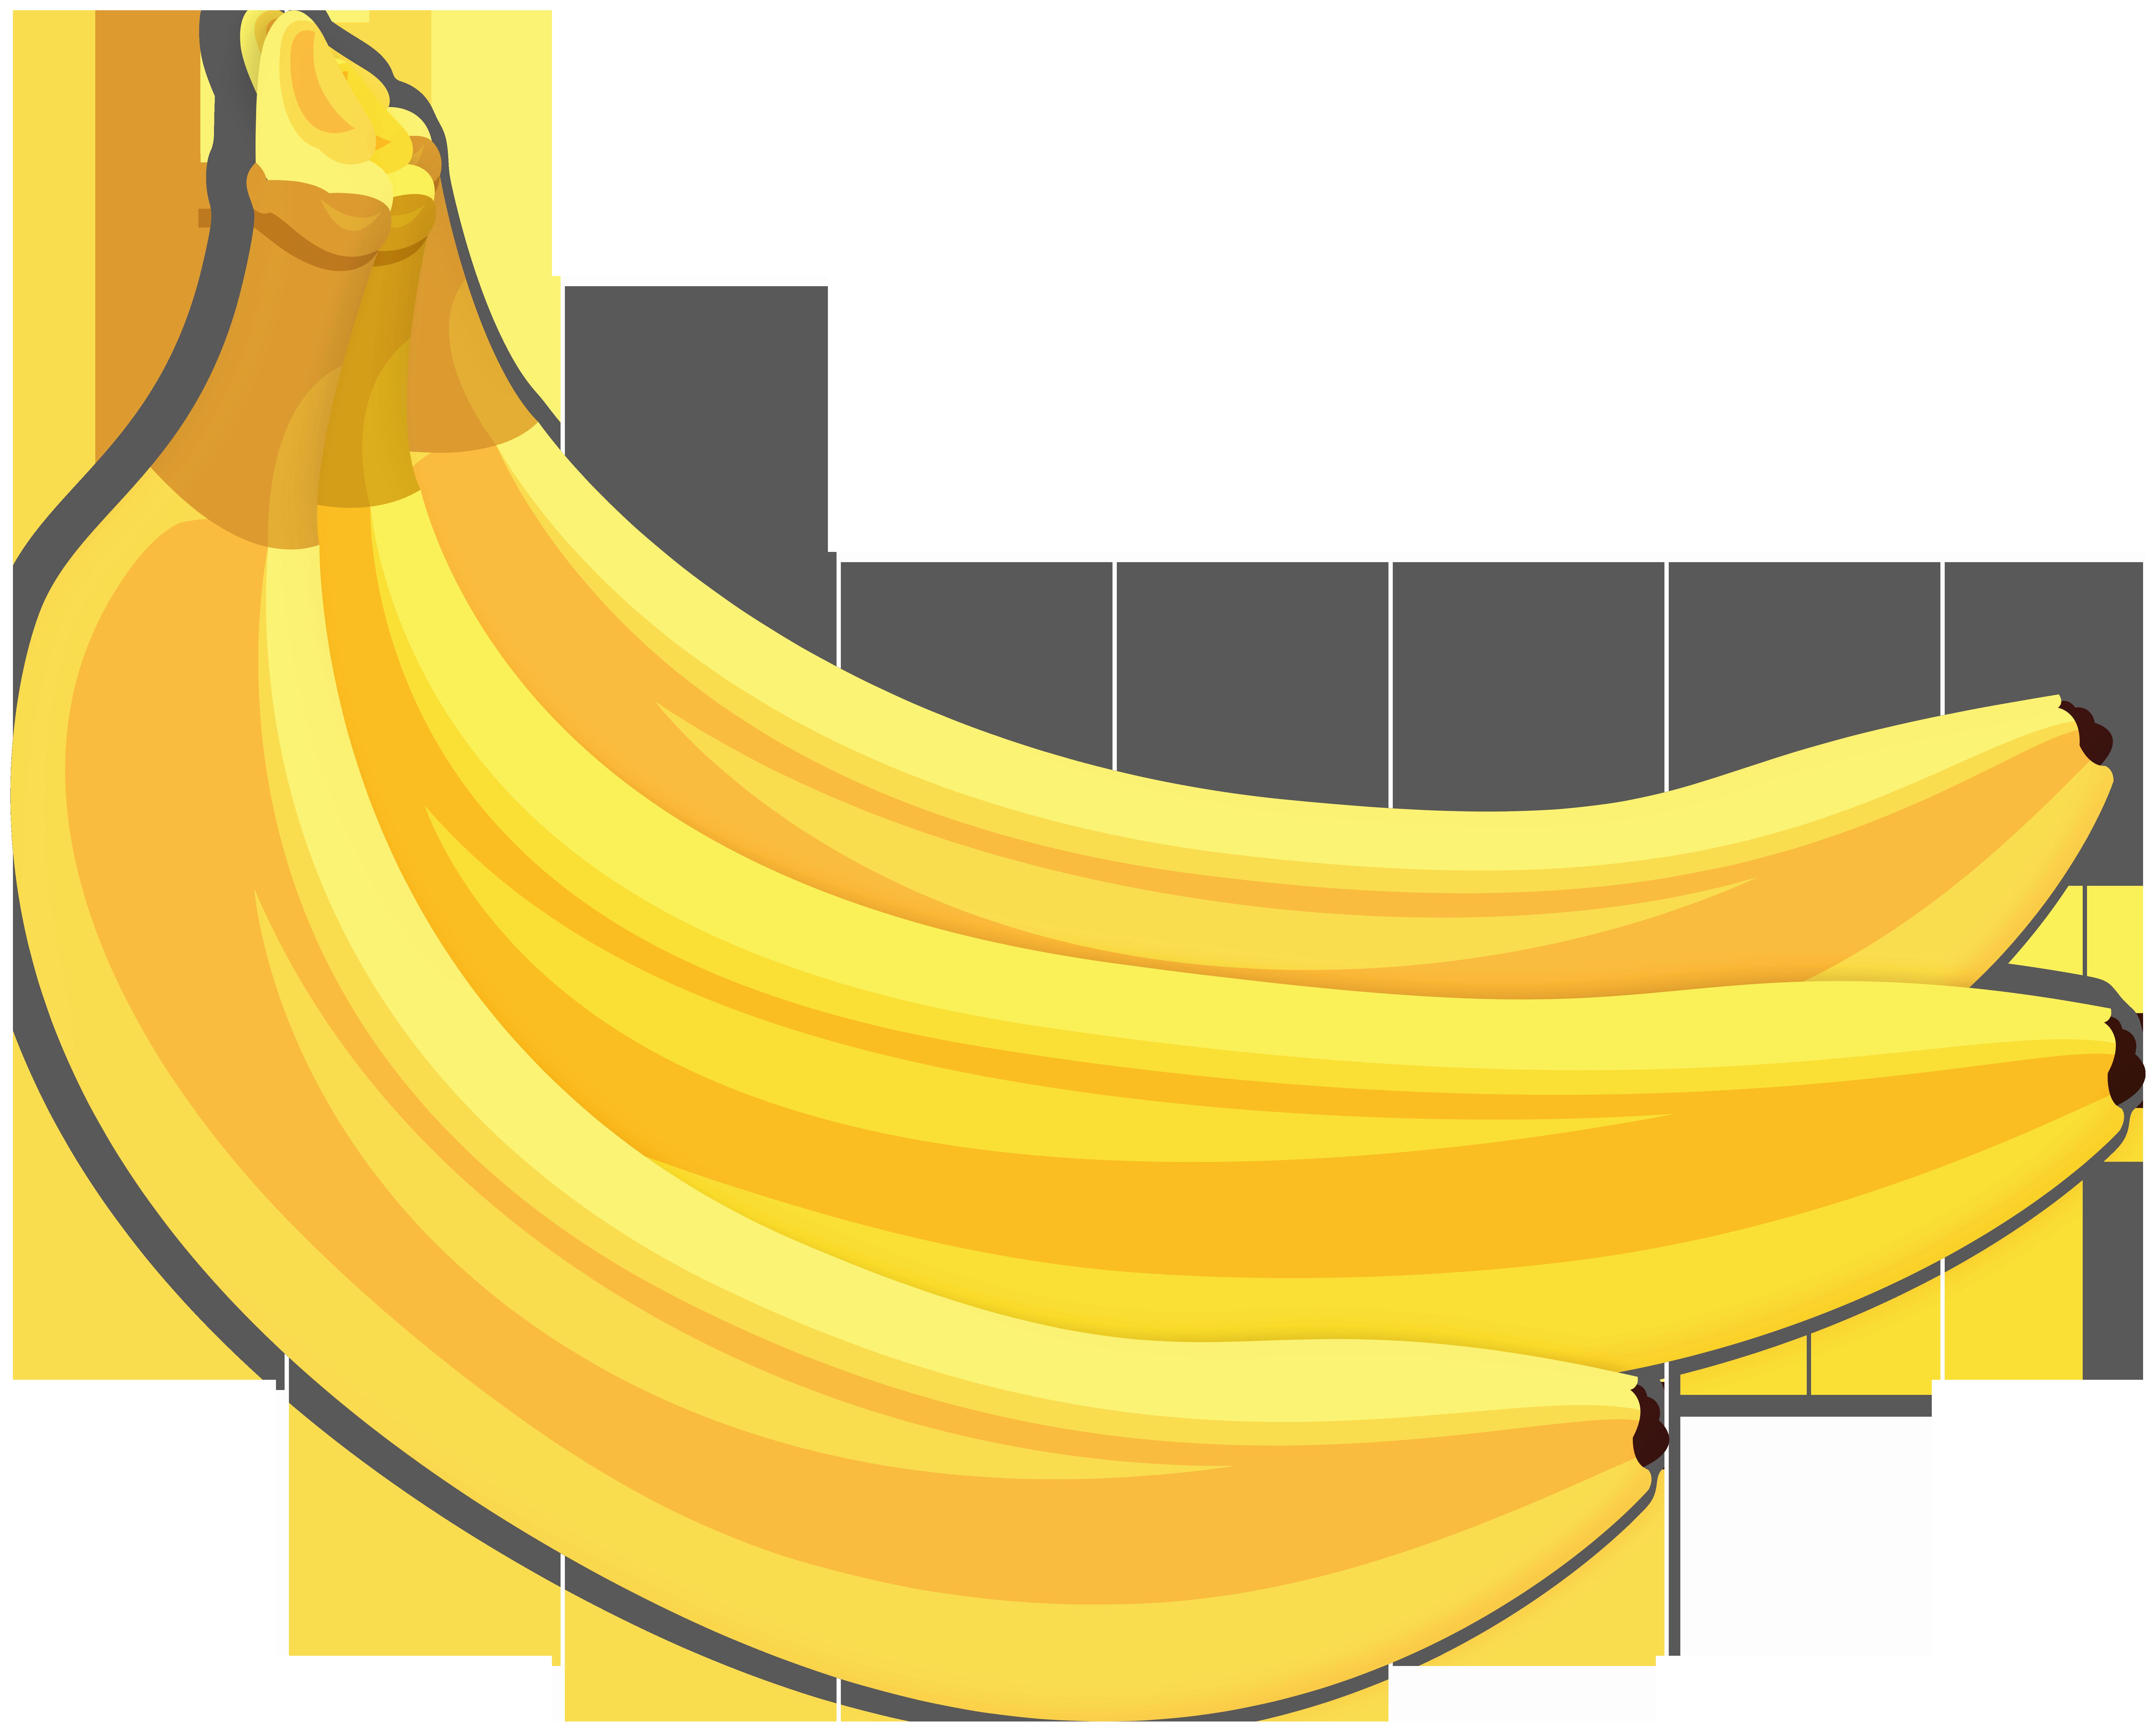 Clipart banana high quality. Bananas png clip art